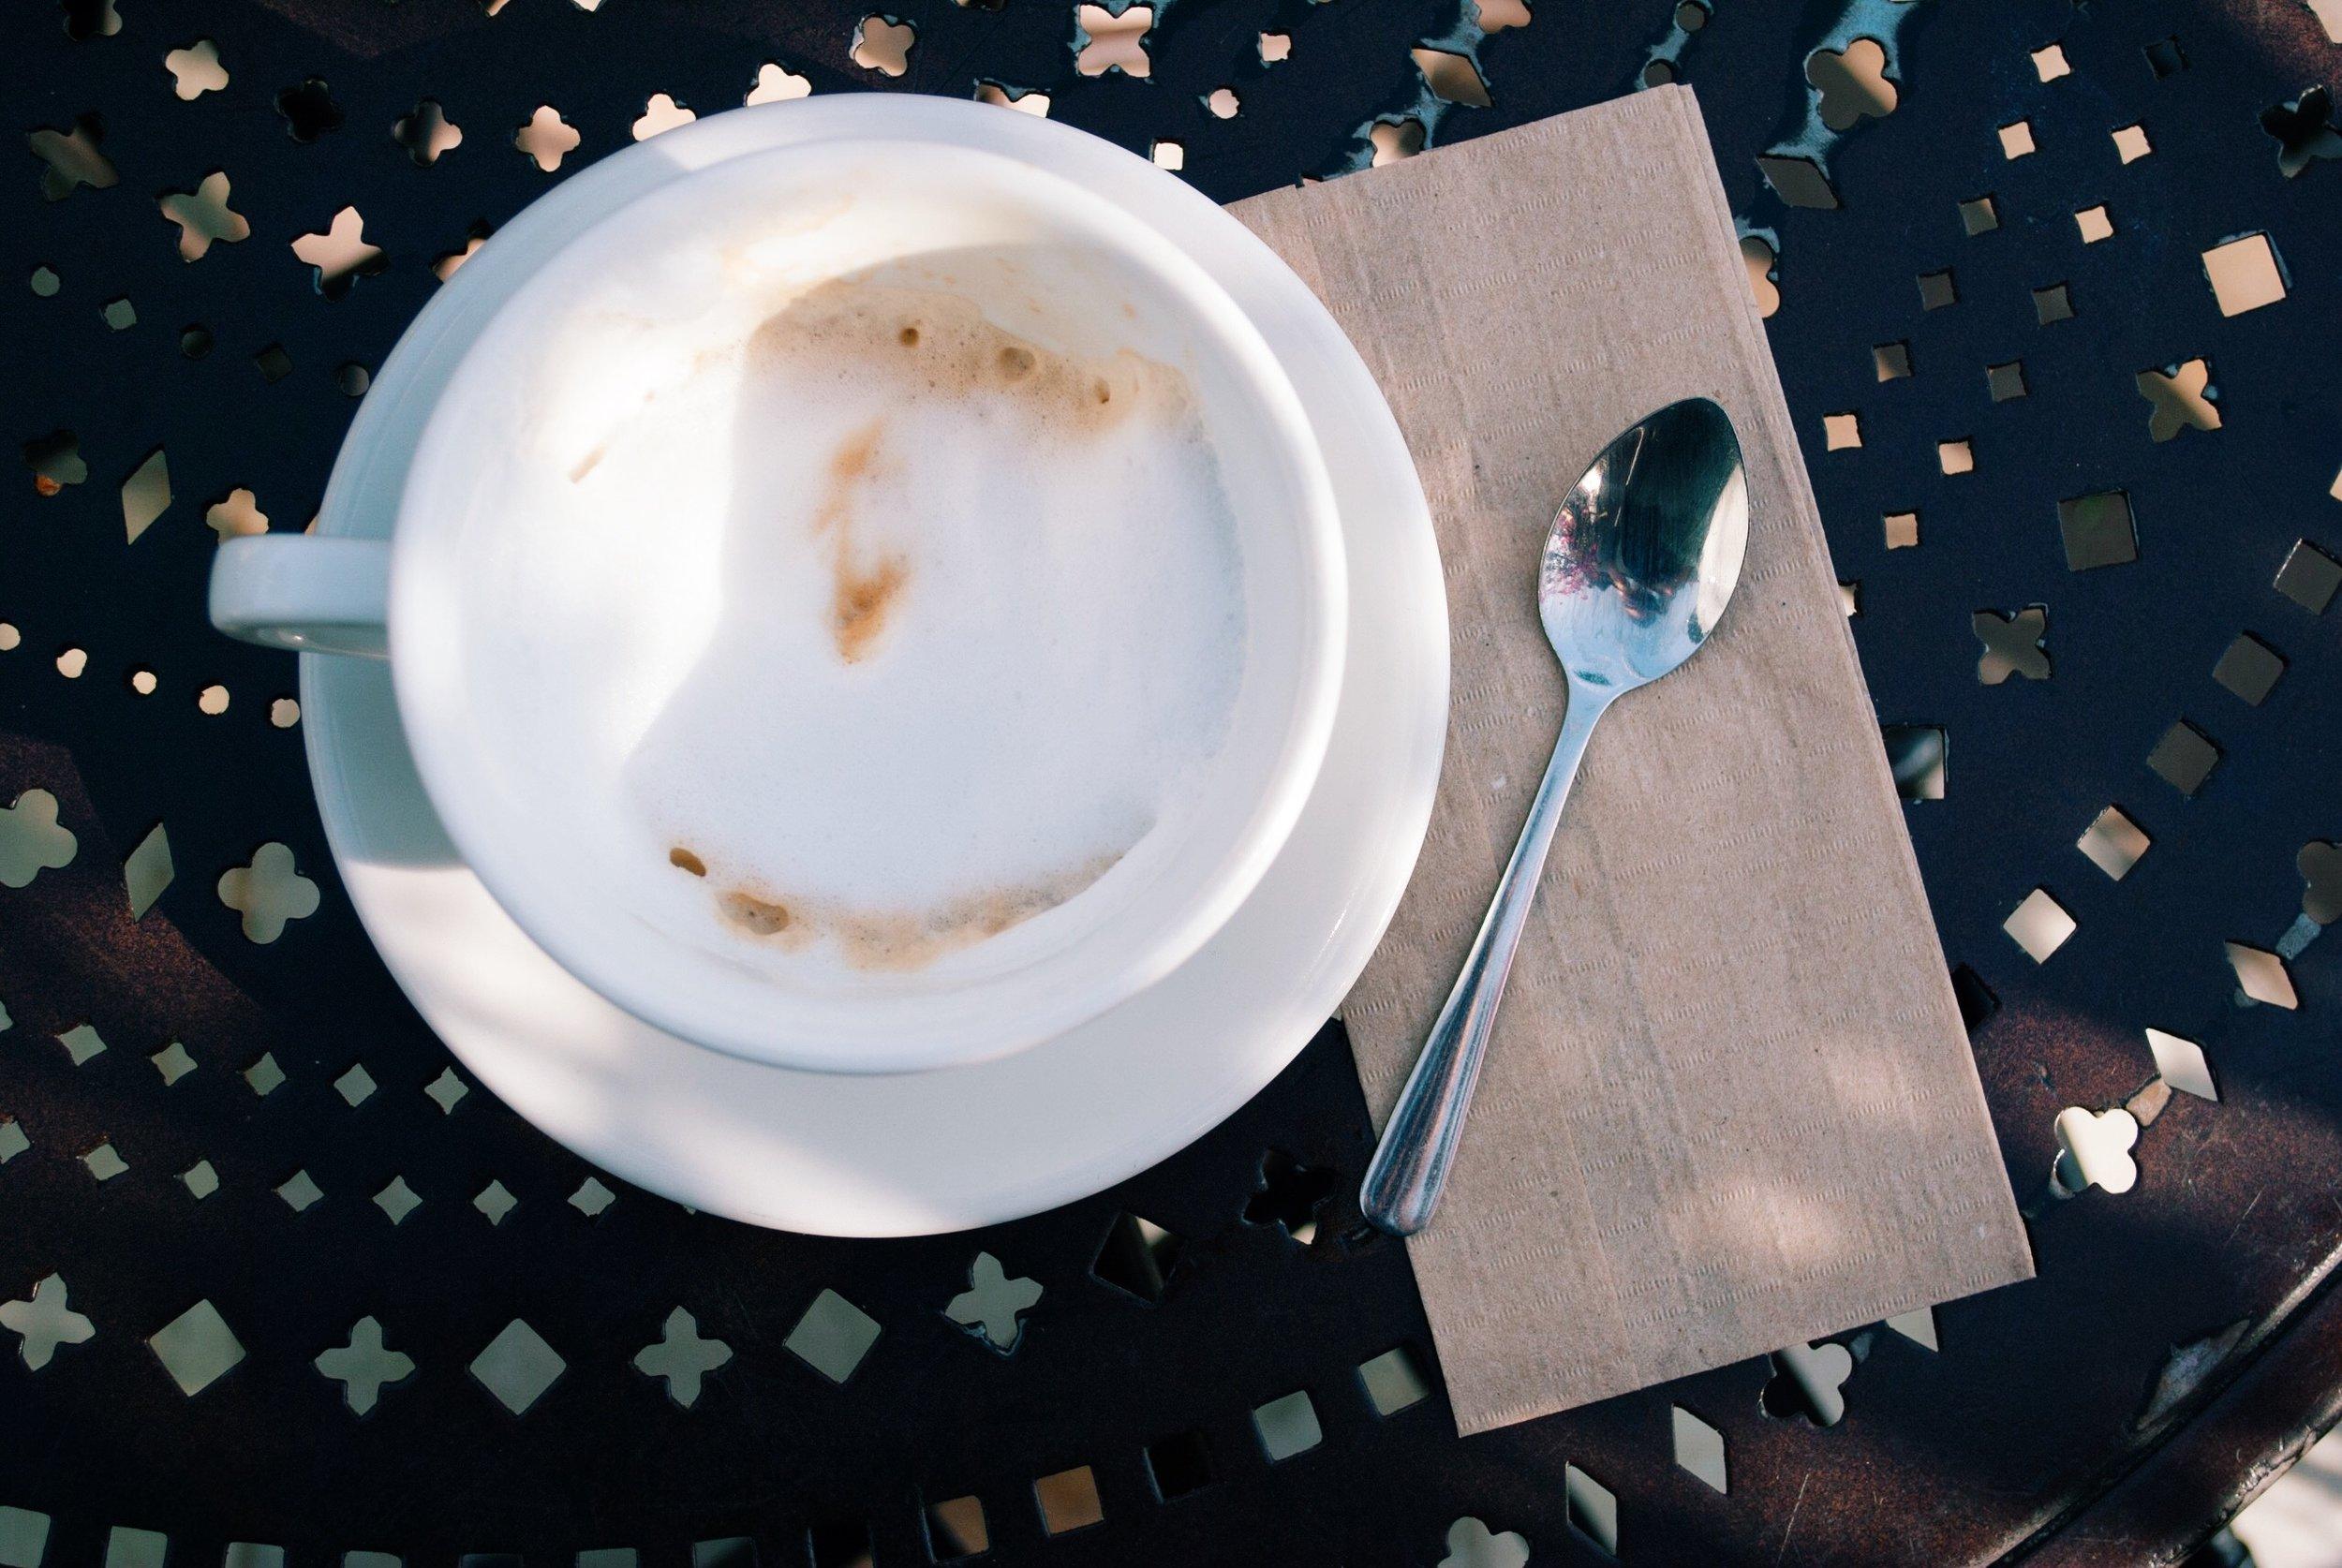 Cappuccino at Urth Caffé, Santa Monica, CA